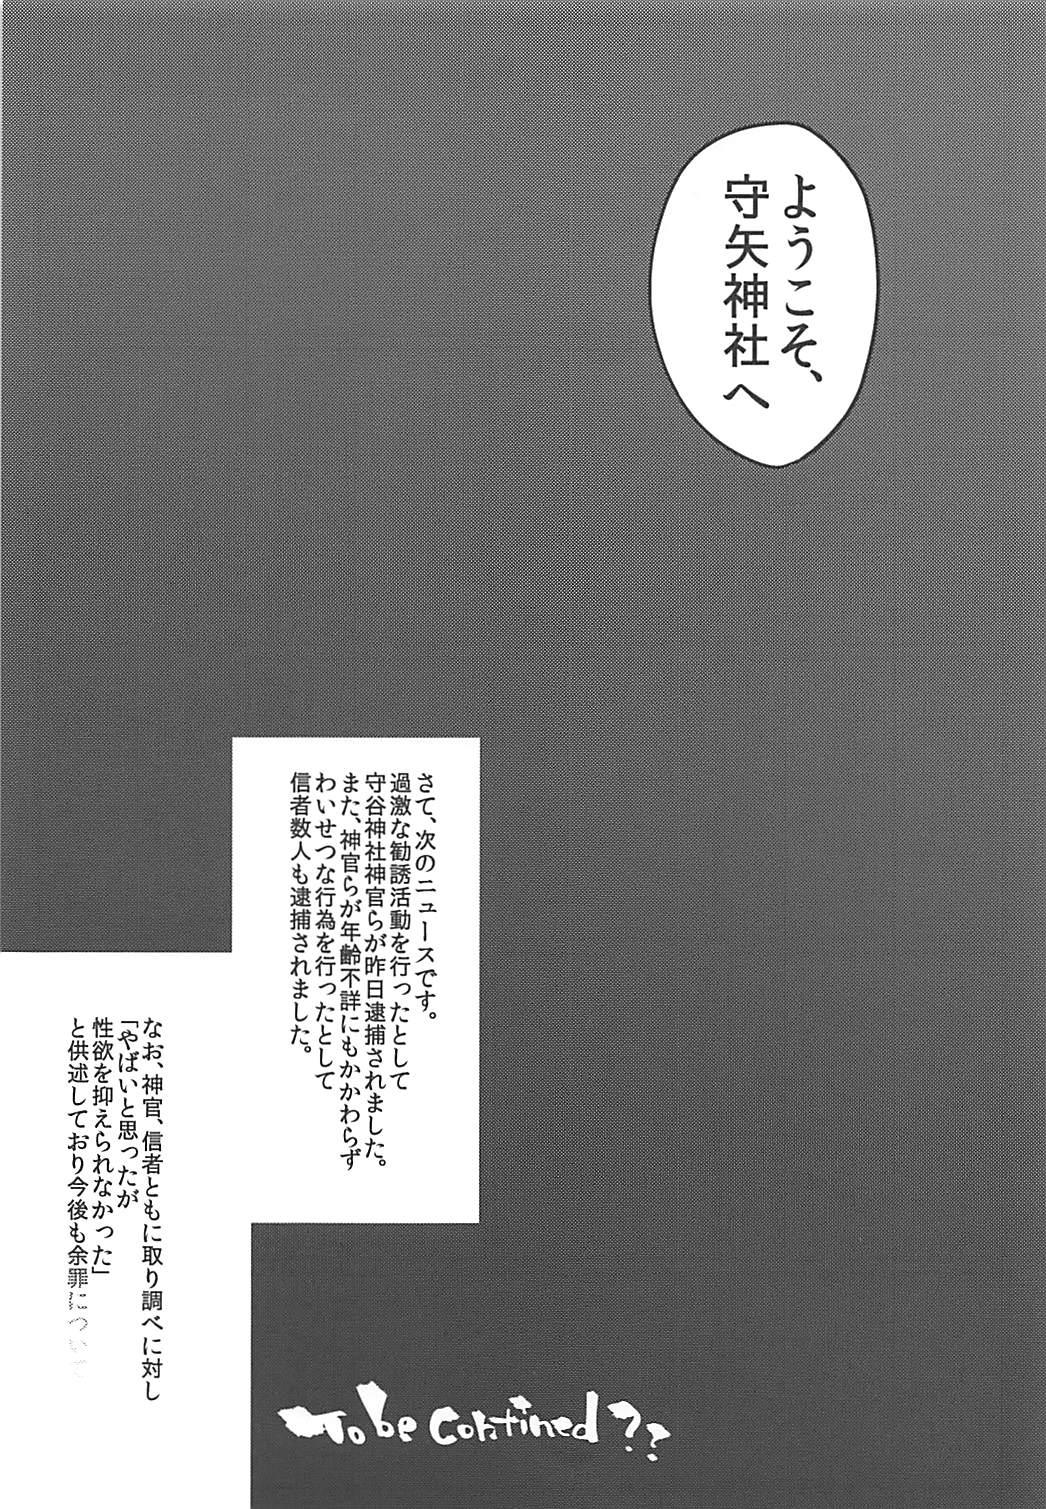 Shinkou Material Sai 29